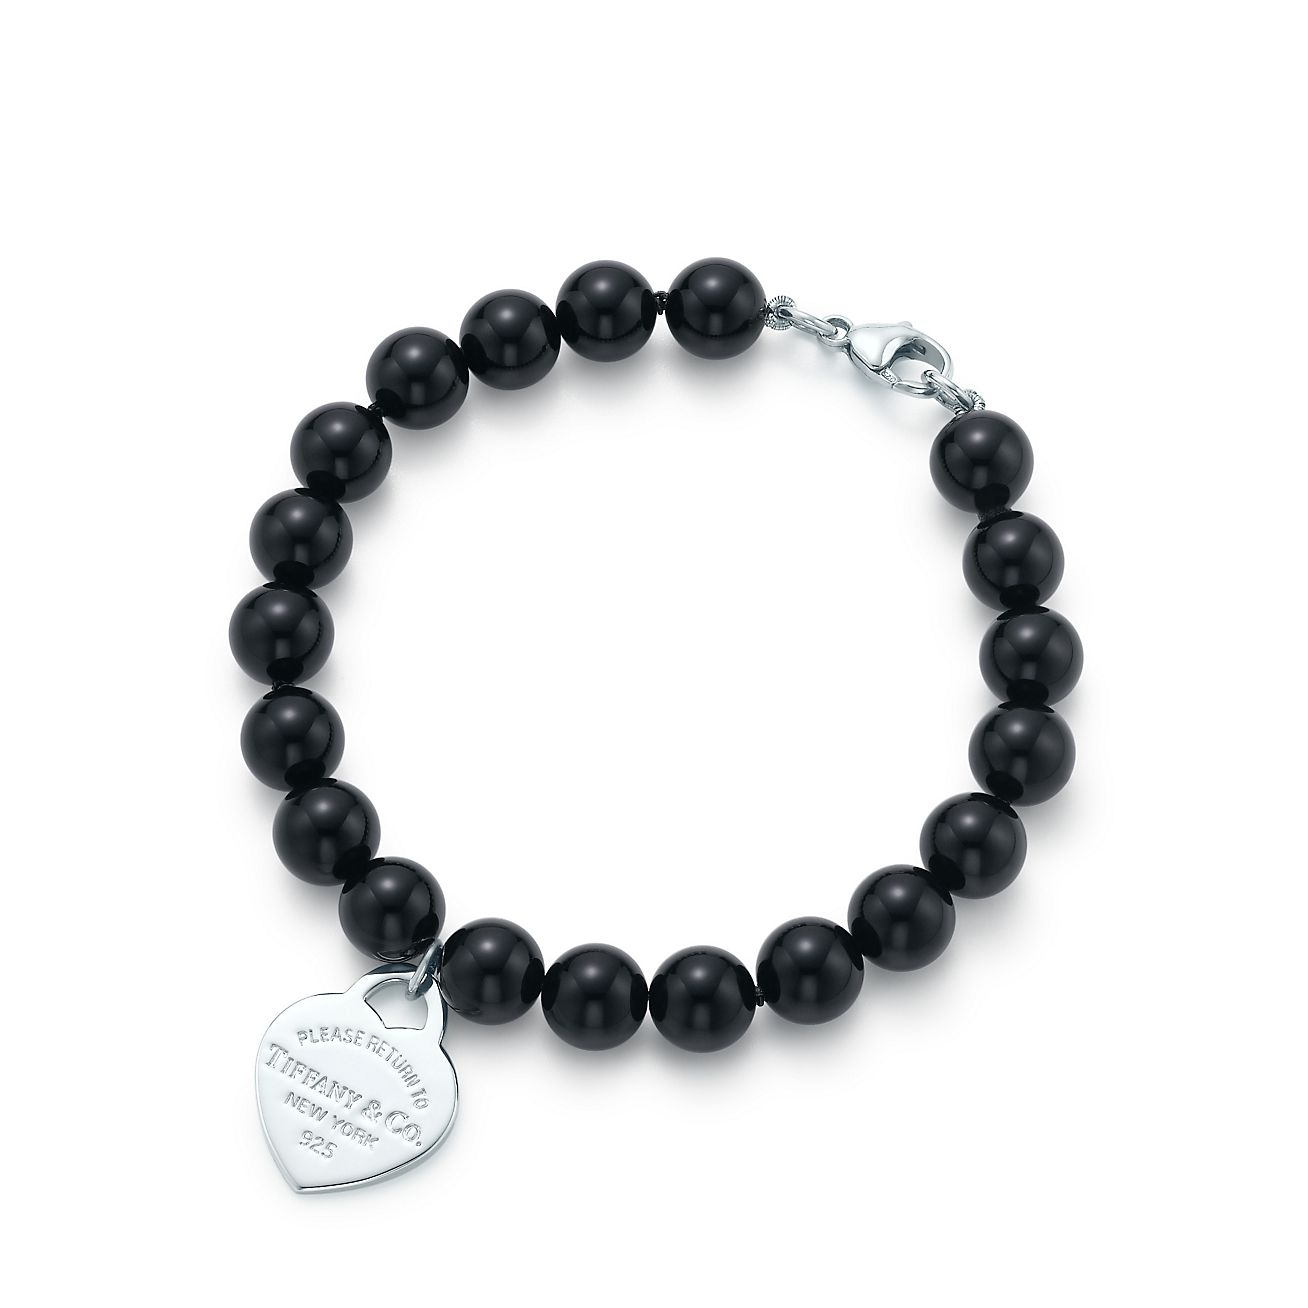 Tiffany Heart Bracelet >> Return to Tiffany® small heart tag in silver on a black onyx bead bracelet. | Tiffany & Co.